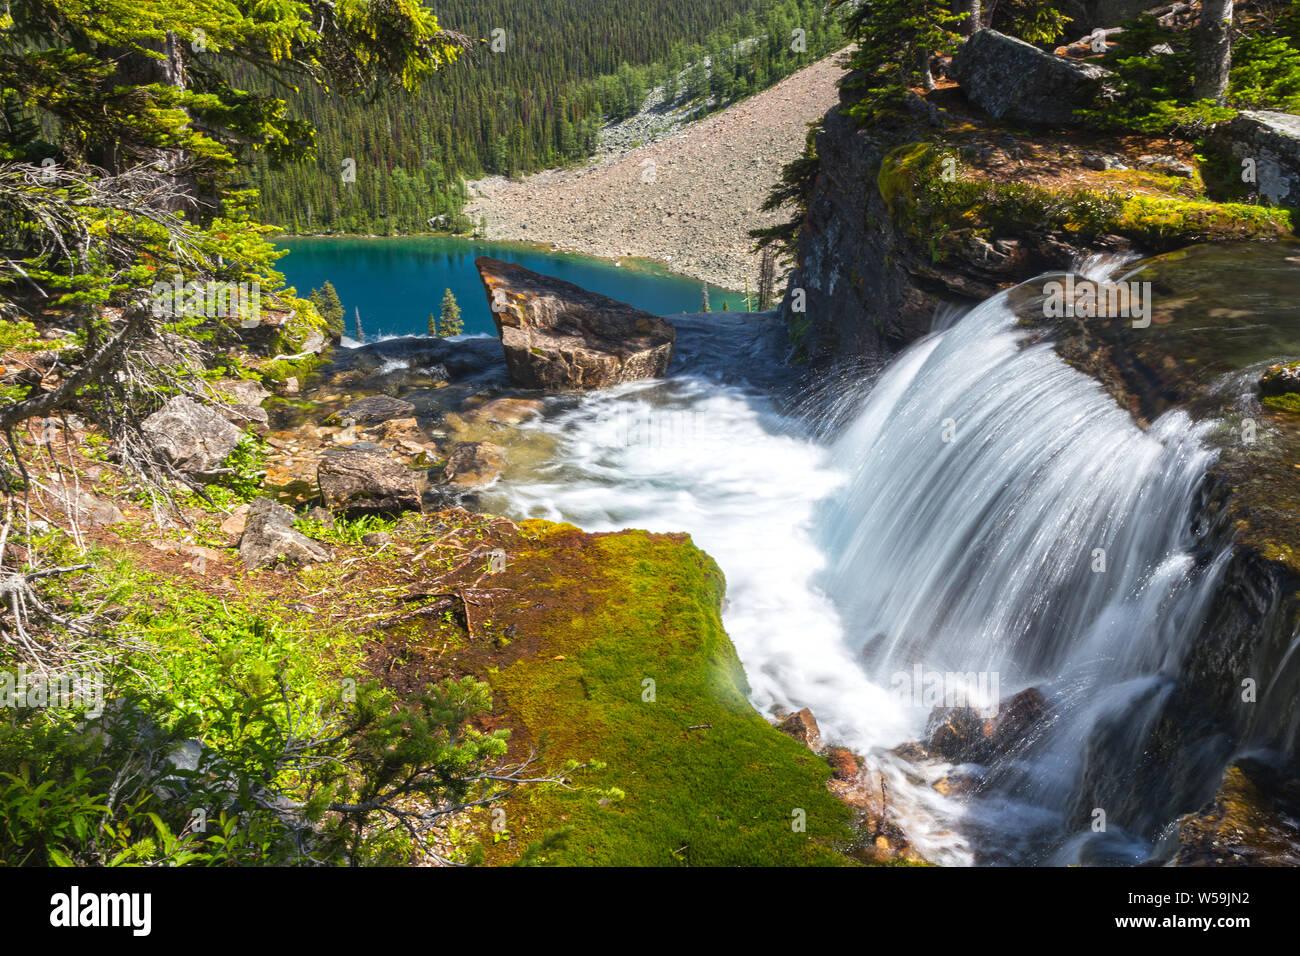 Beautiful Cascading Waterfall, Green Moss and Blue Egypt Lake Landscape Scenery Banff National Park Canadian Rocky Mountains Stock Photo